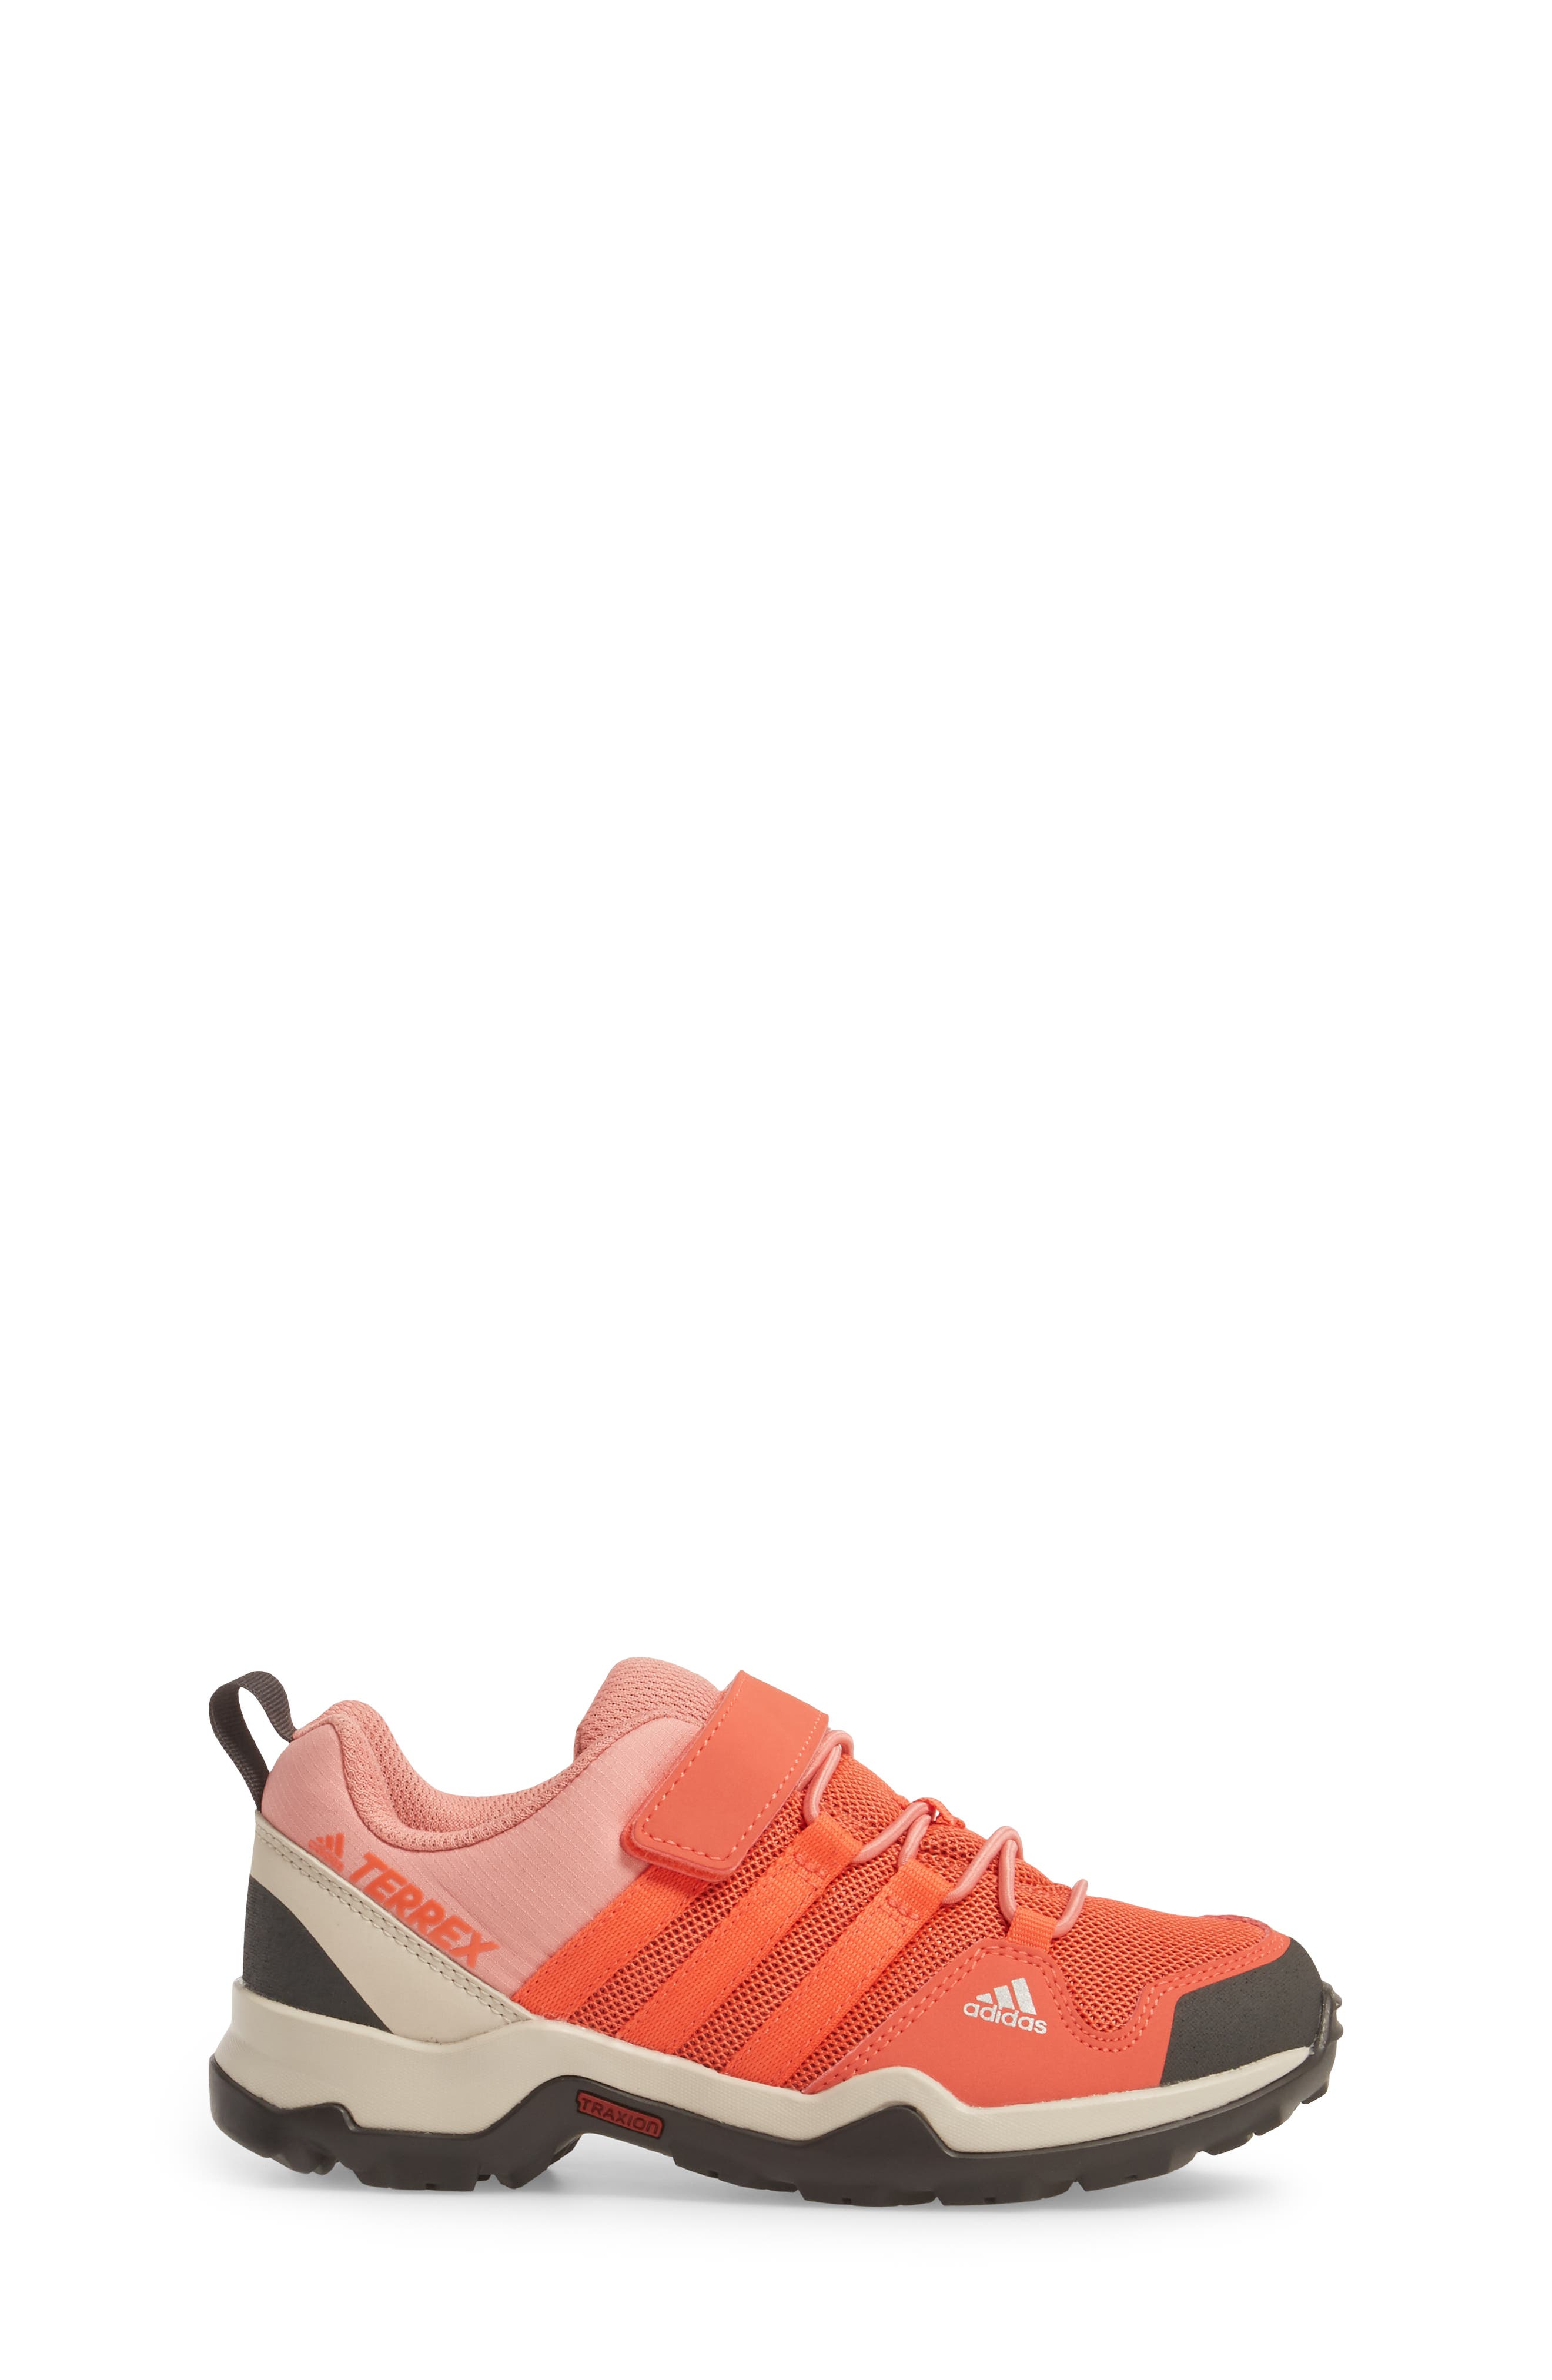 Terrex AX2R Sneaker,                             Alternate thumbnail 3, color,                             Easy Coral/ Tactile Rose